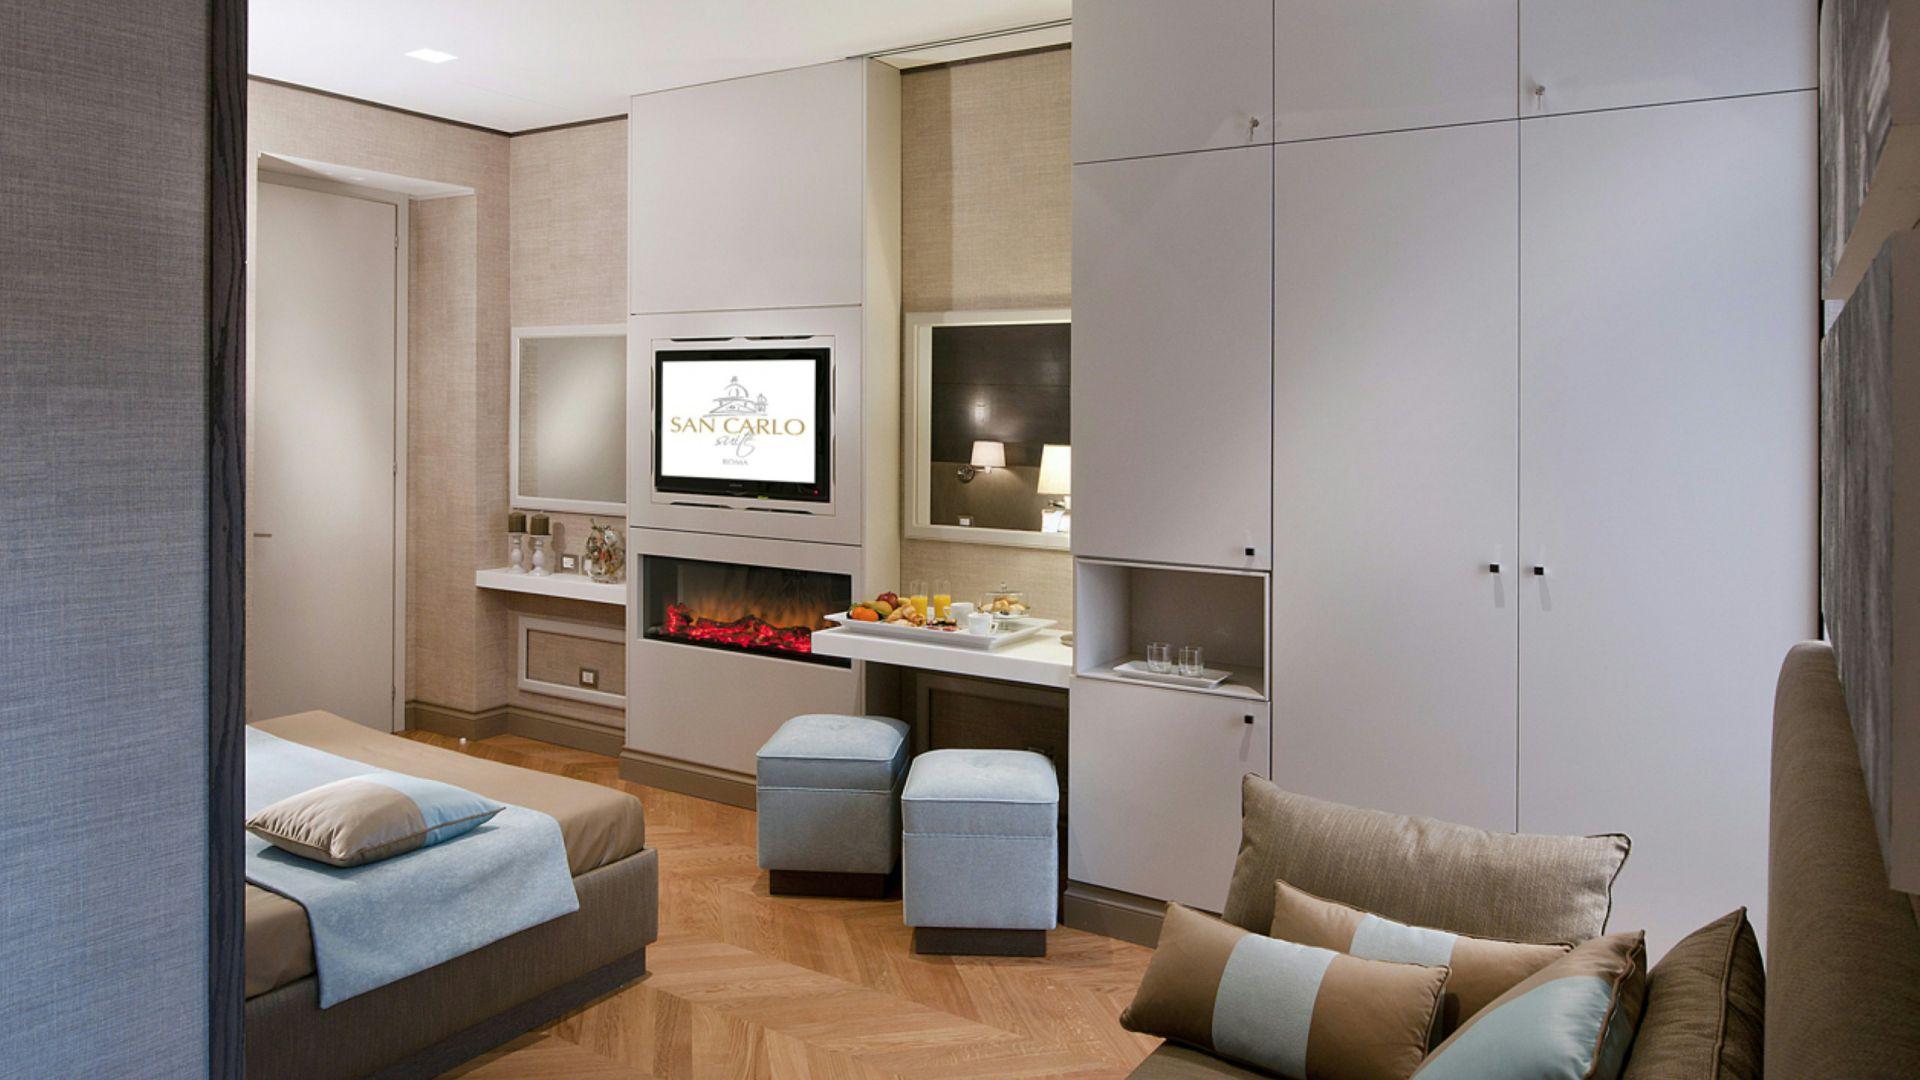 San-Carlo-Suite-Rome-deluxe-suite-2